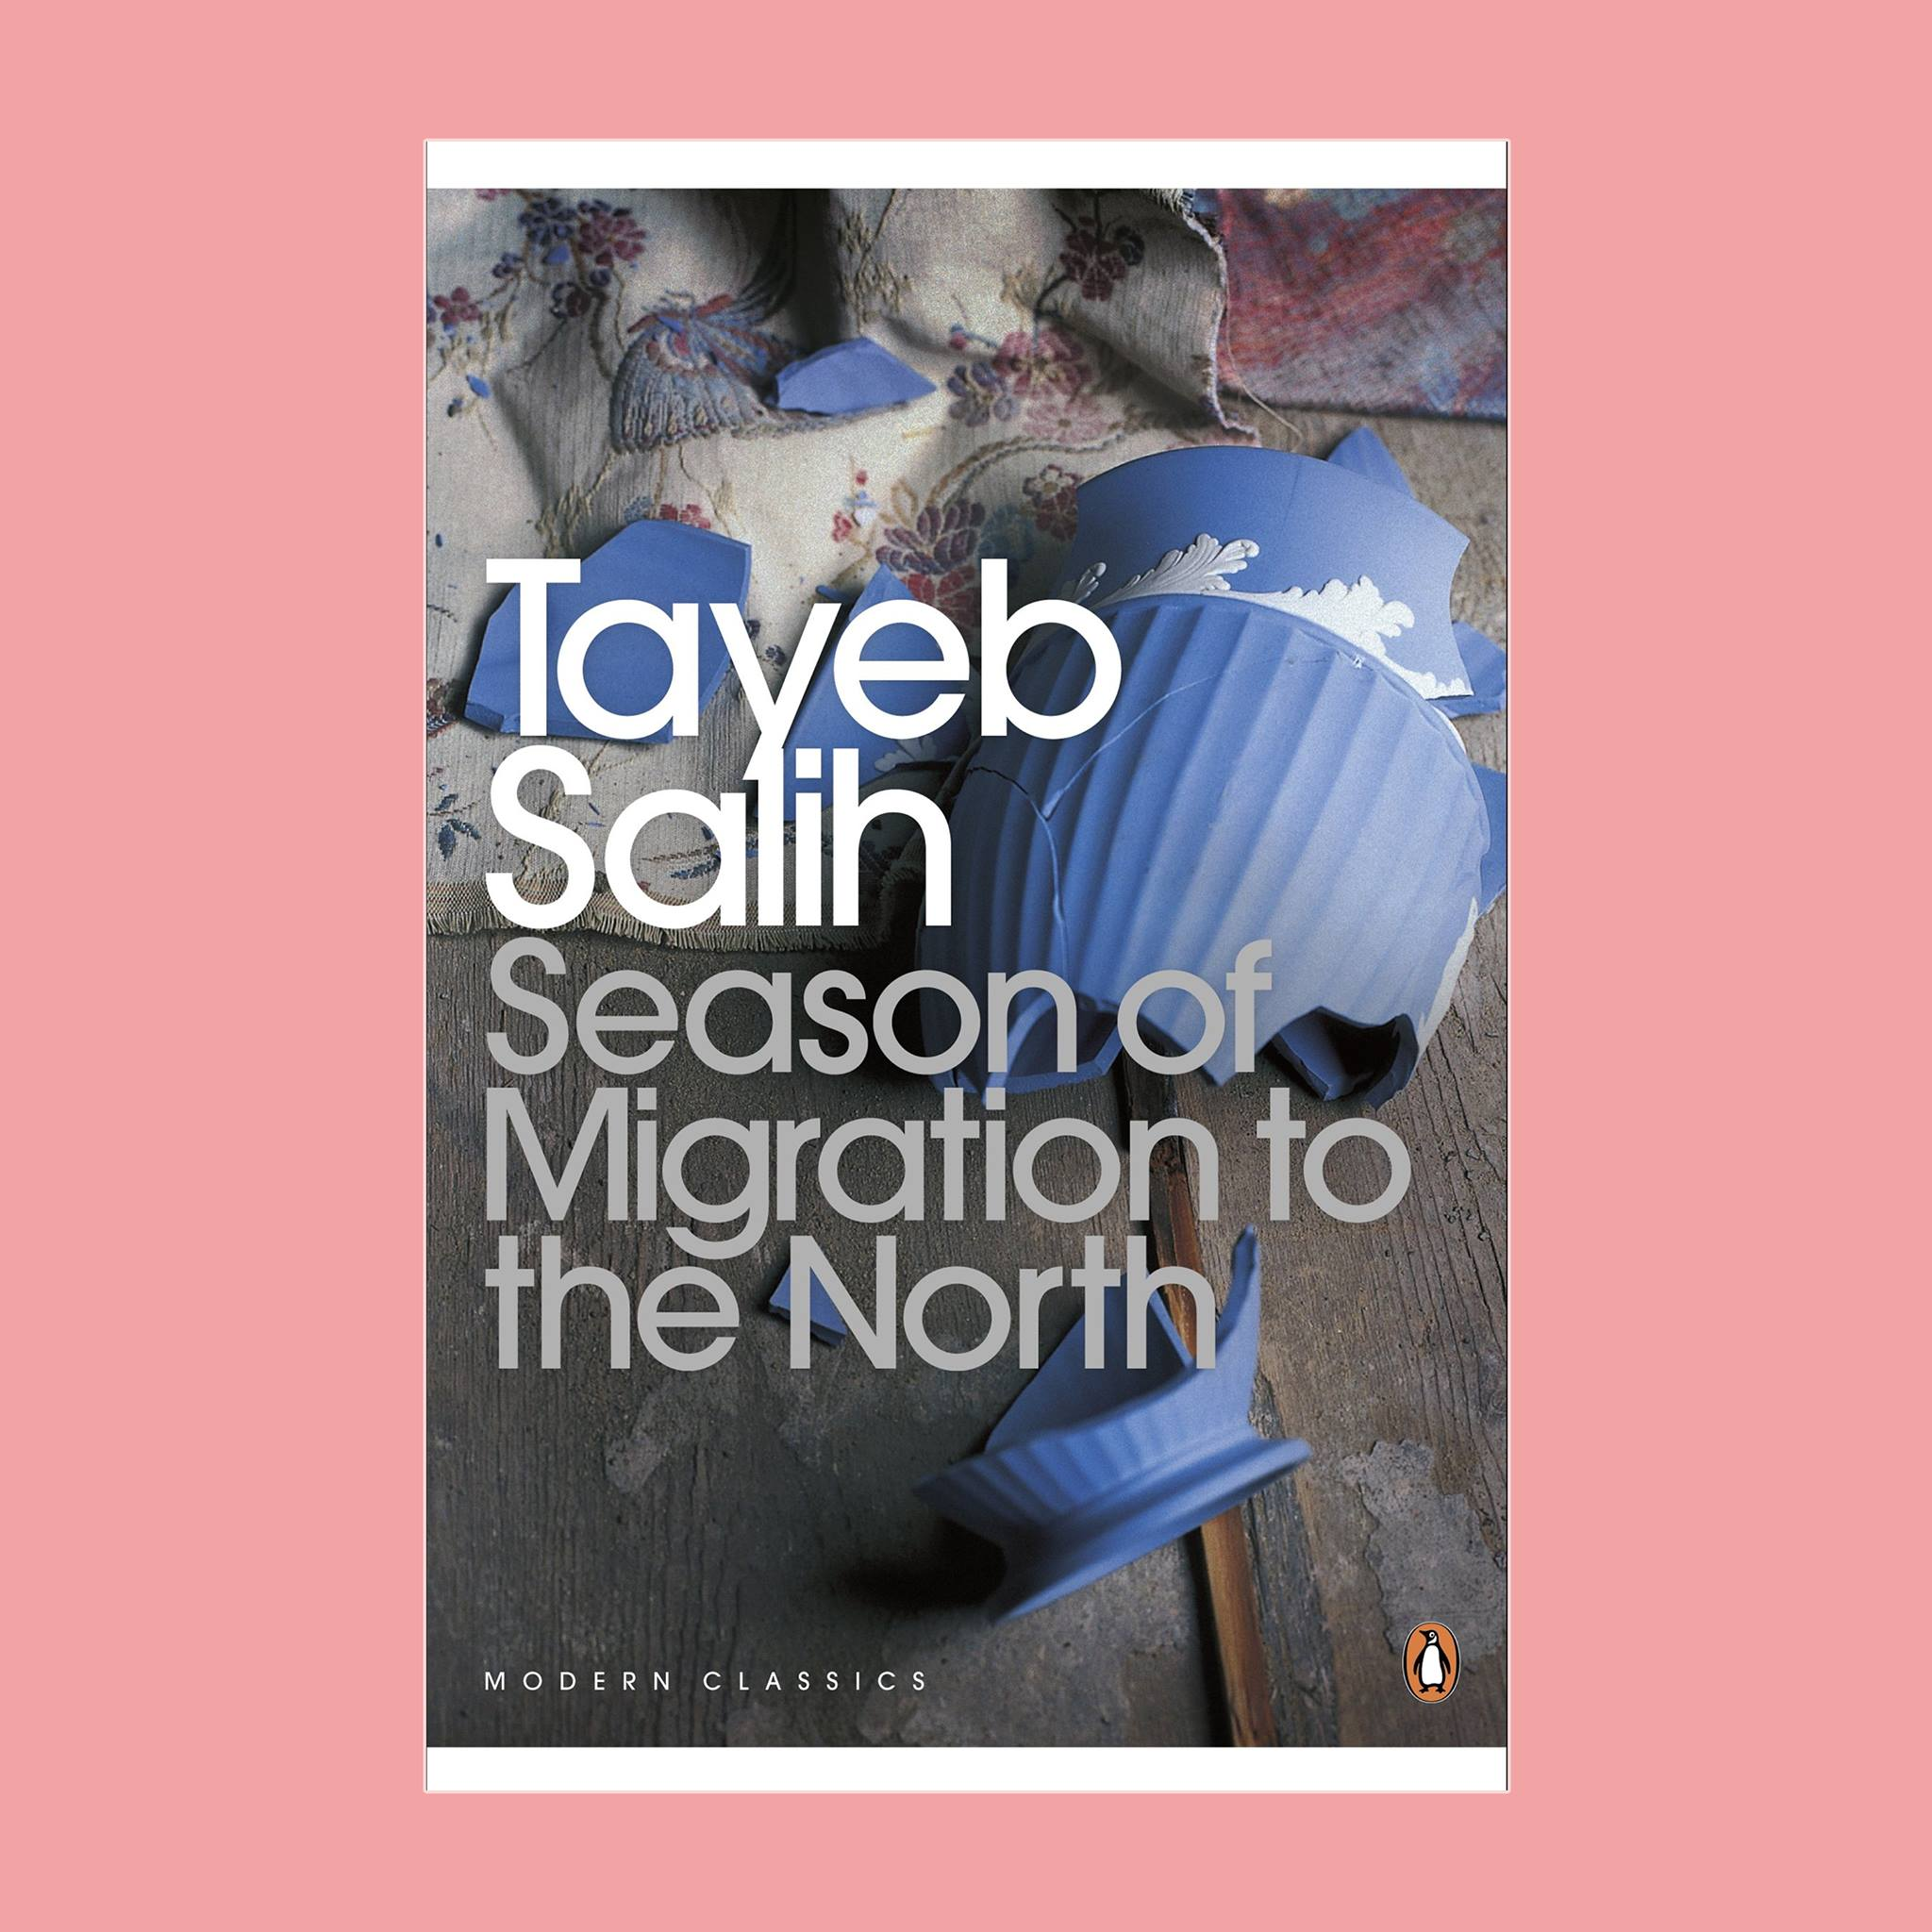 POA bookclub #2 |Tayeb Salih's Season of Migration to the North - Thursday 07.07.2018 Libreria 65 Hanbury Street, E1